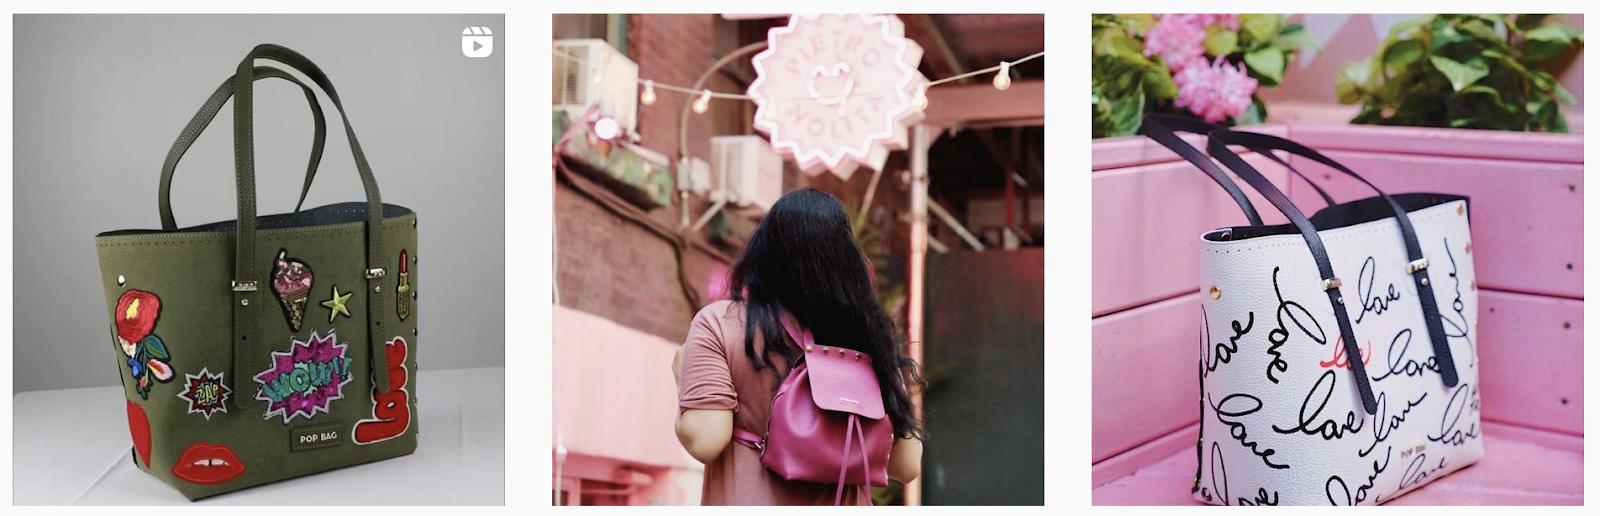 Pop Bag USA | Social Media Gallery of Latest Bag Collection